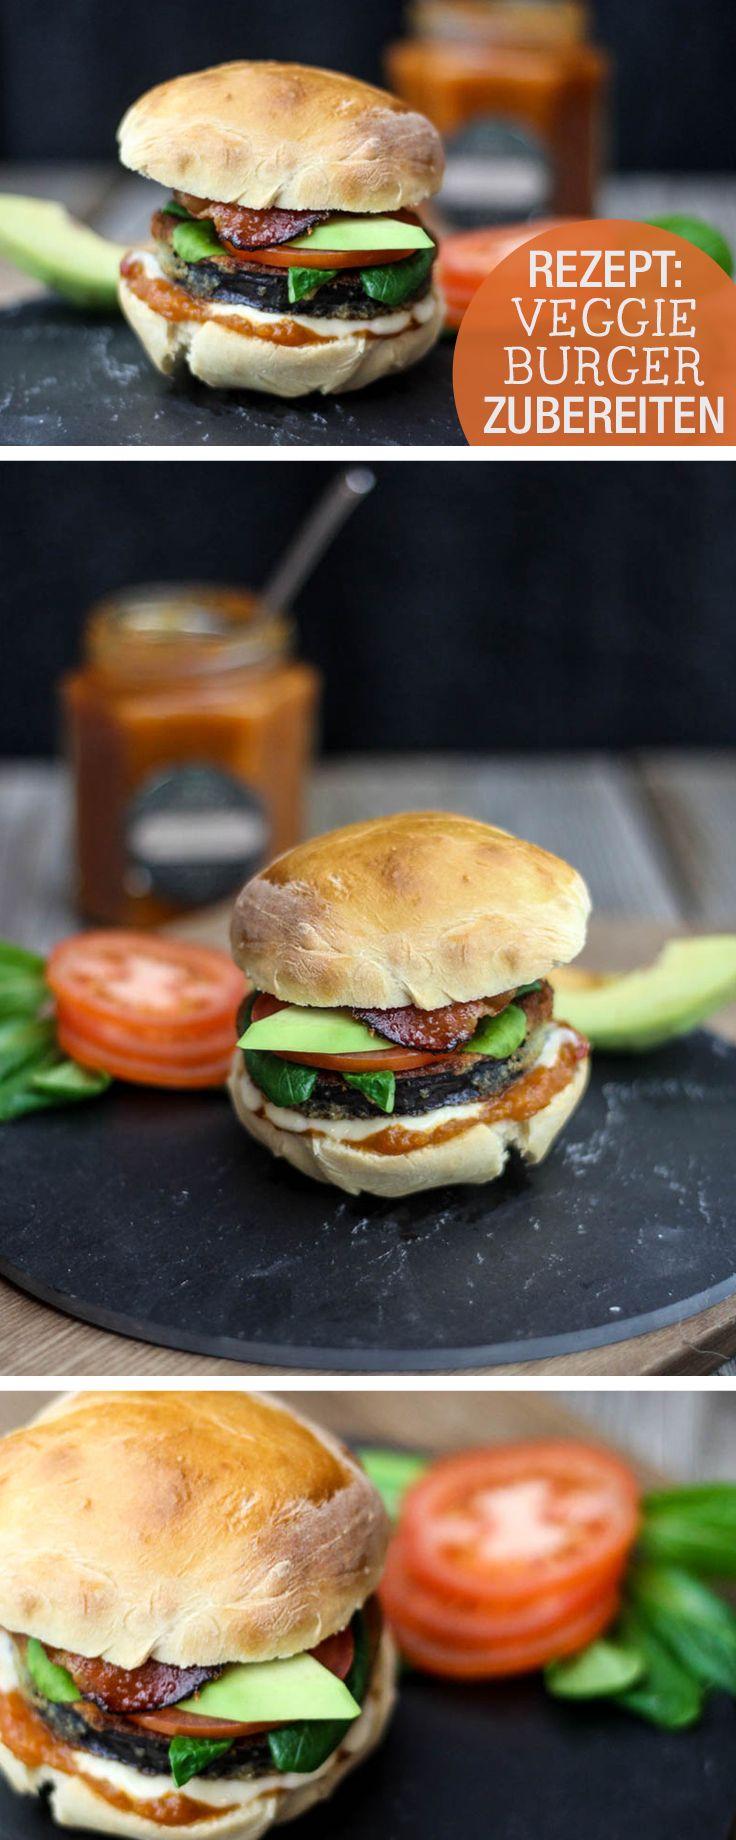 Rezept: Veggie-Burger mit Aubergine und Avocado zubereiten / recipe: veggie-burger with aubergine and avocado via DaWanda.com